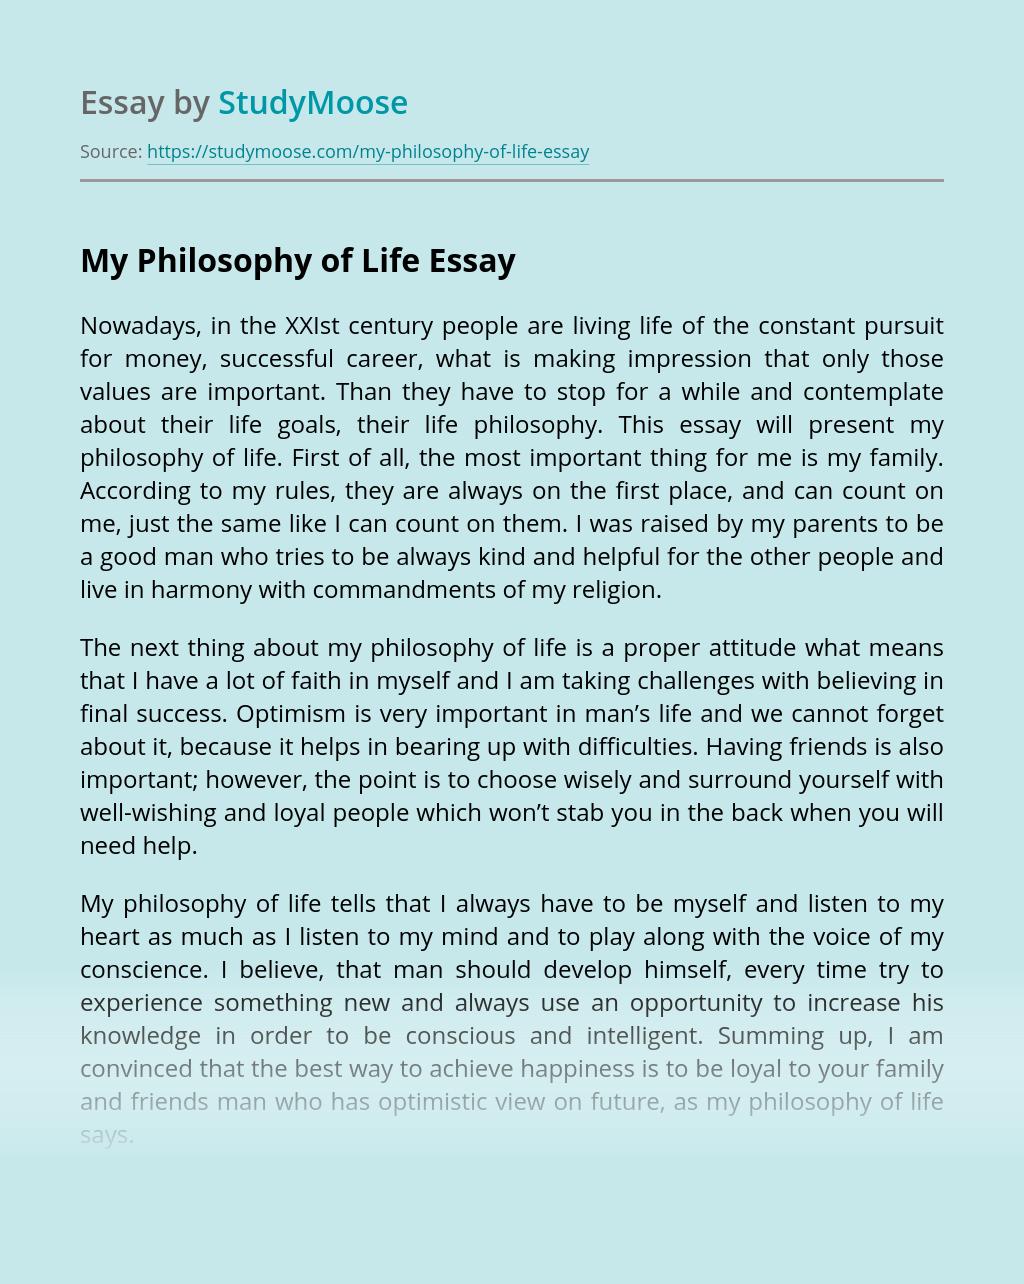 My Philosophy of Life